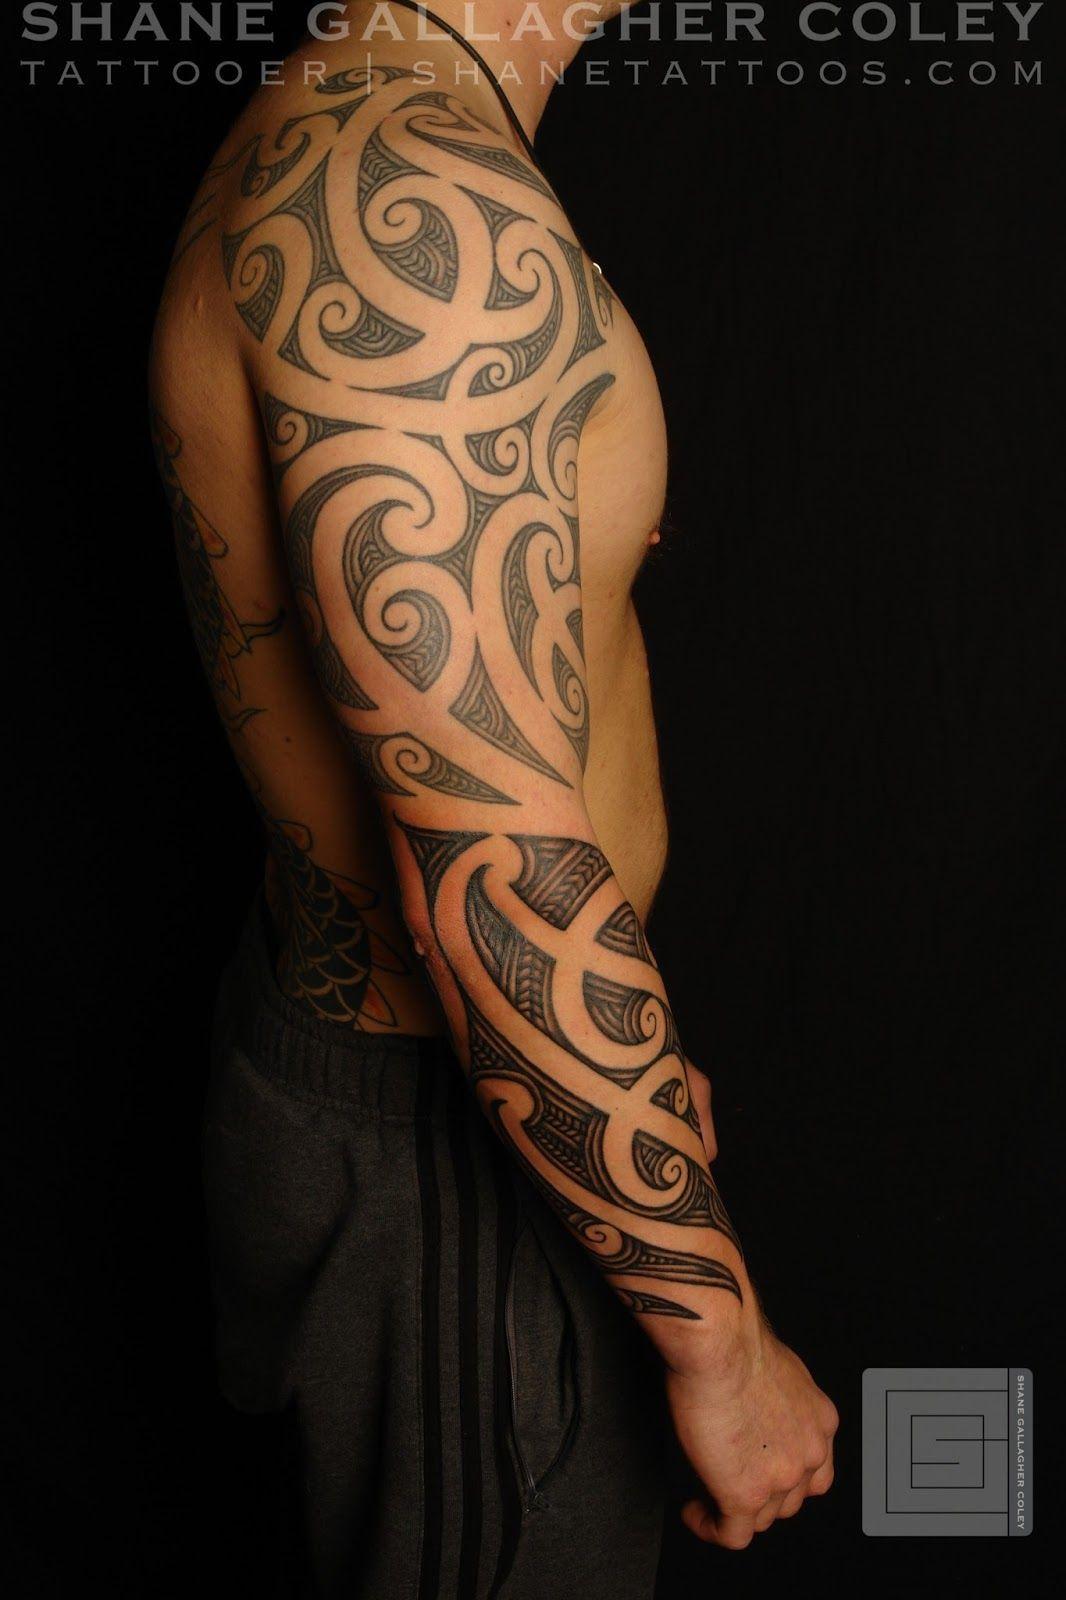 Maori Arm Tattoo Designs: Maori Tattoo By Shane Gallagher